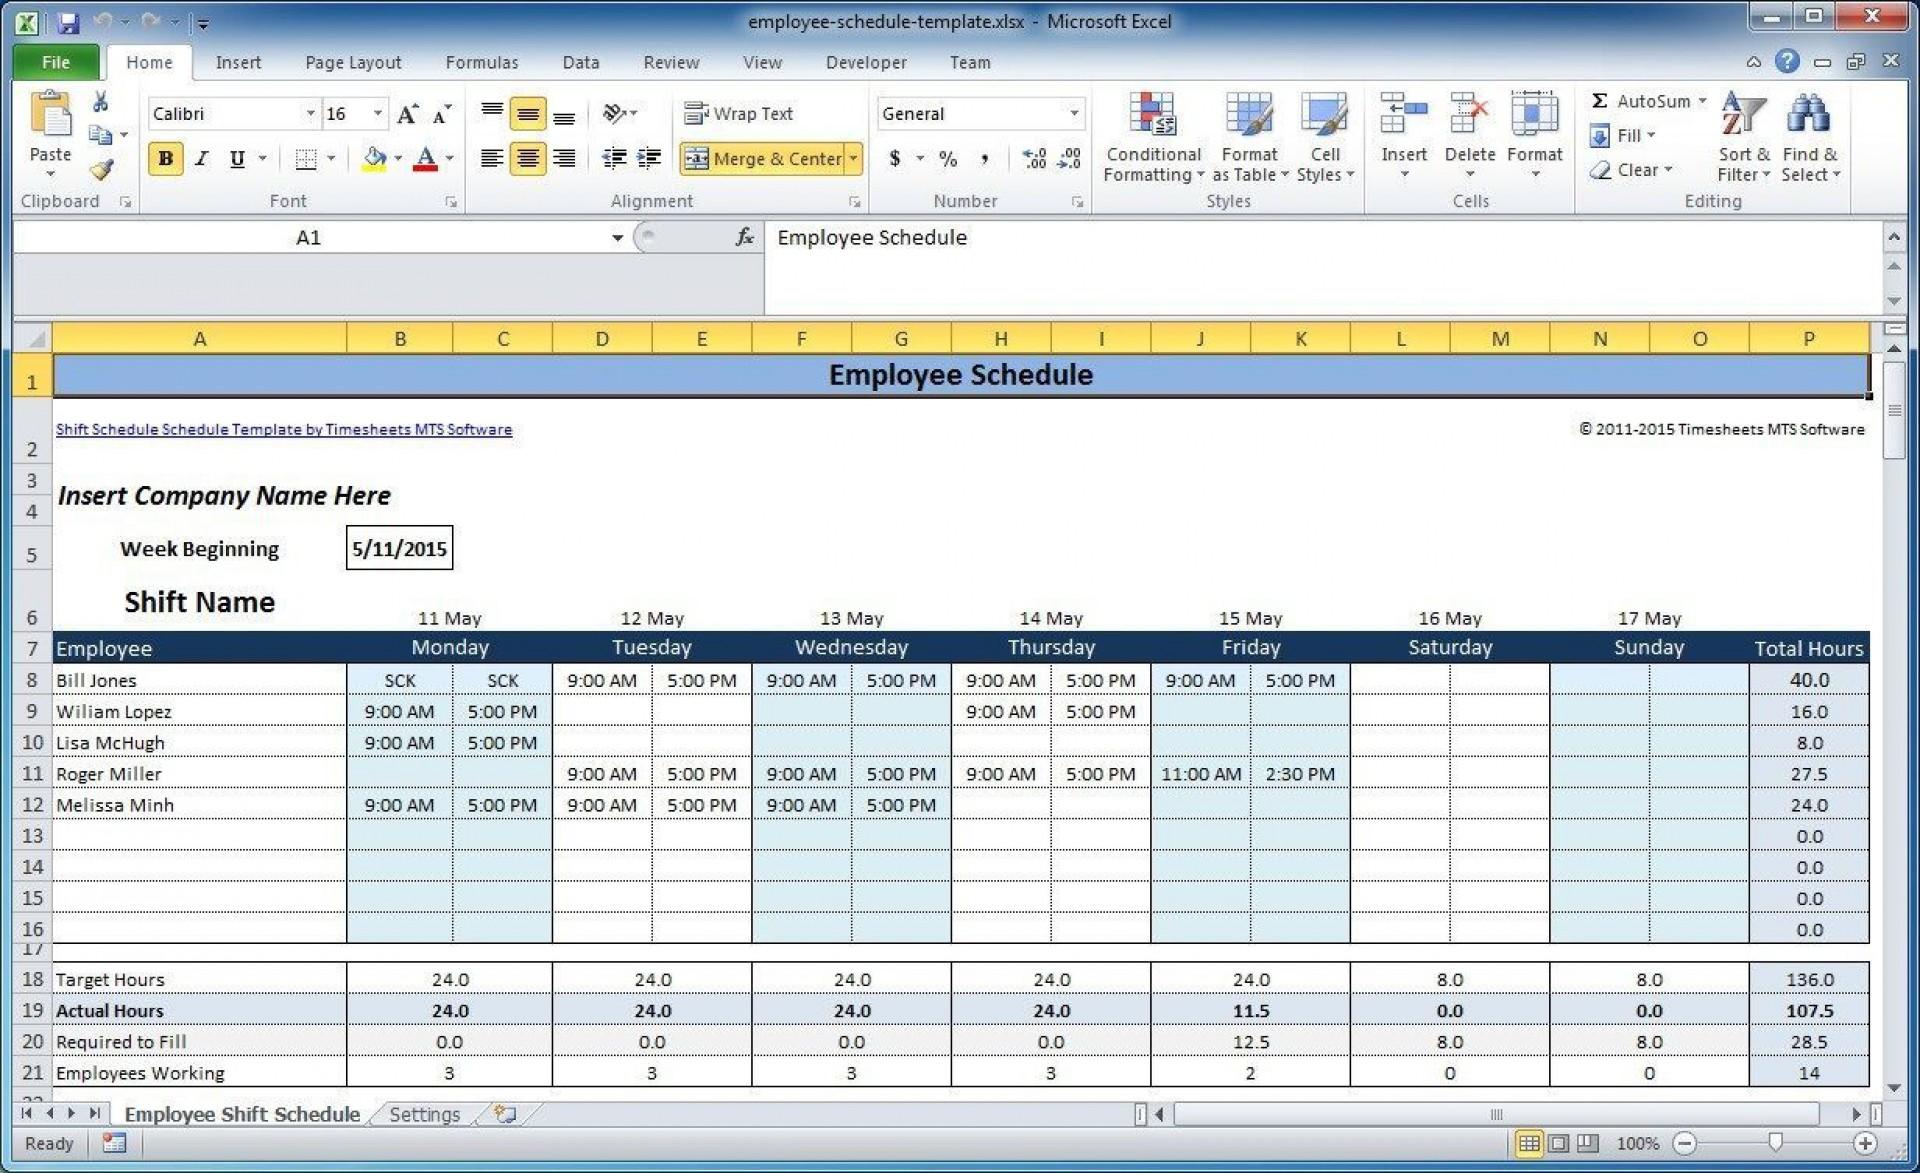 001 Wonderful Employee Shift Scheduling Template Image  Schedule Google Sheet Work Plan Word Weekly Excel Free1920